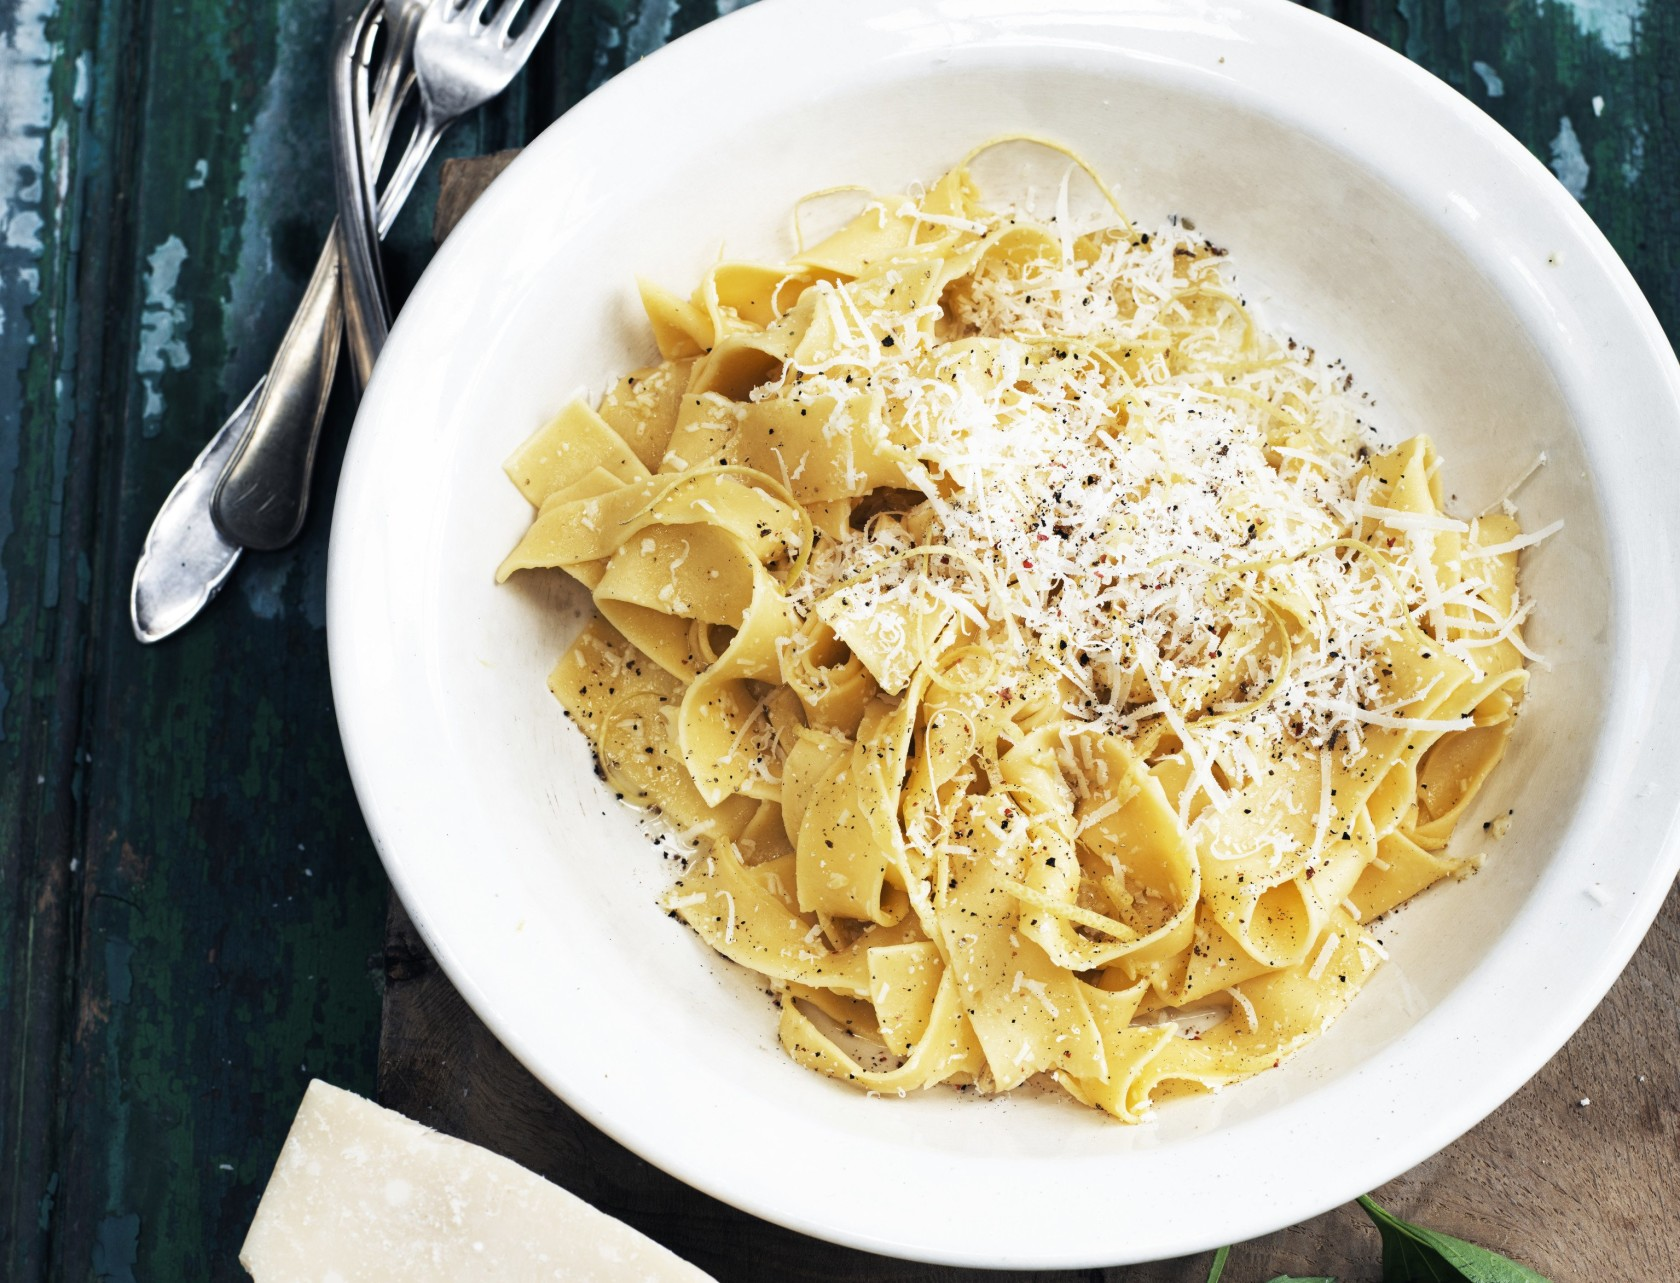 Pasta med citronsauce - virkelig lækker italiensk opskrift!